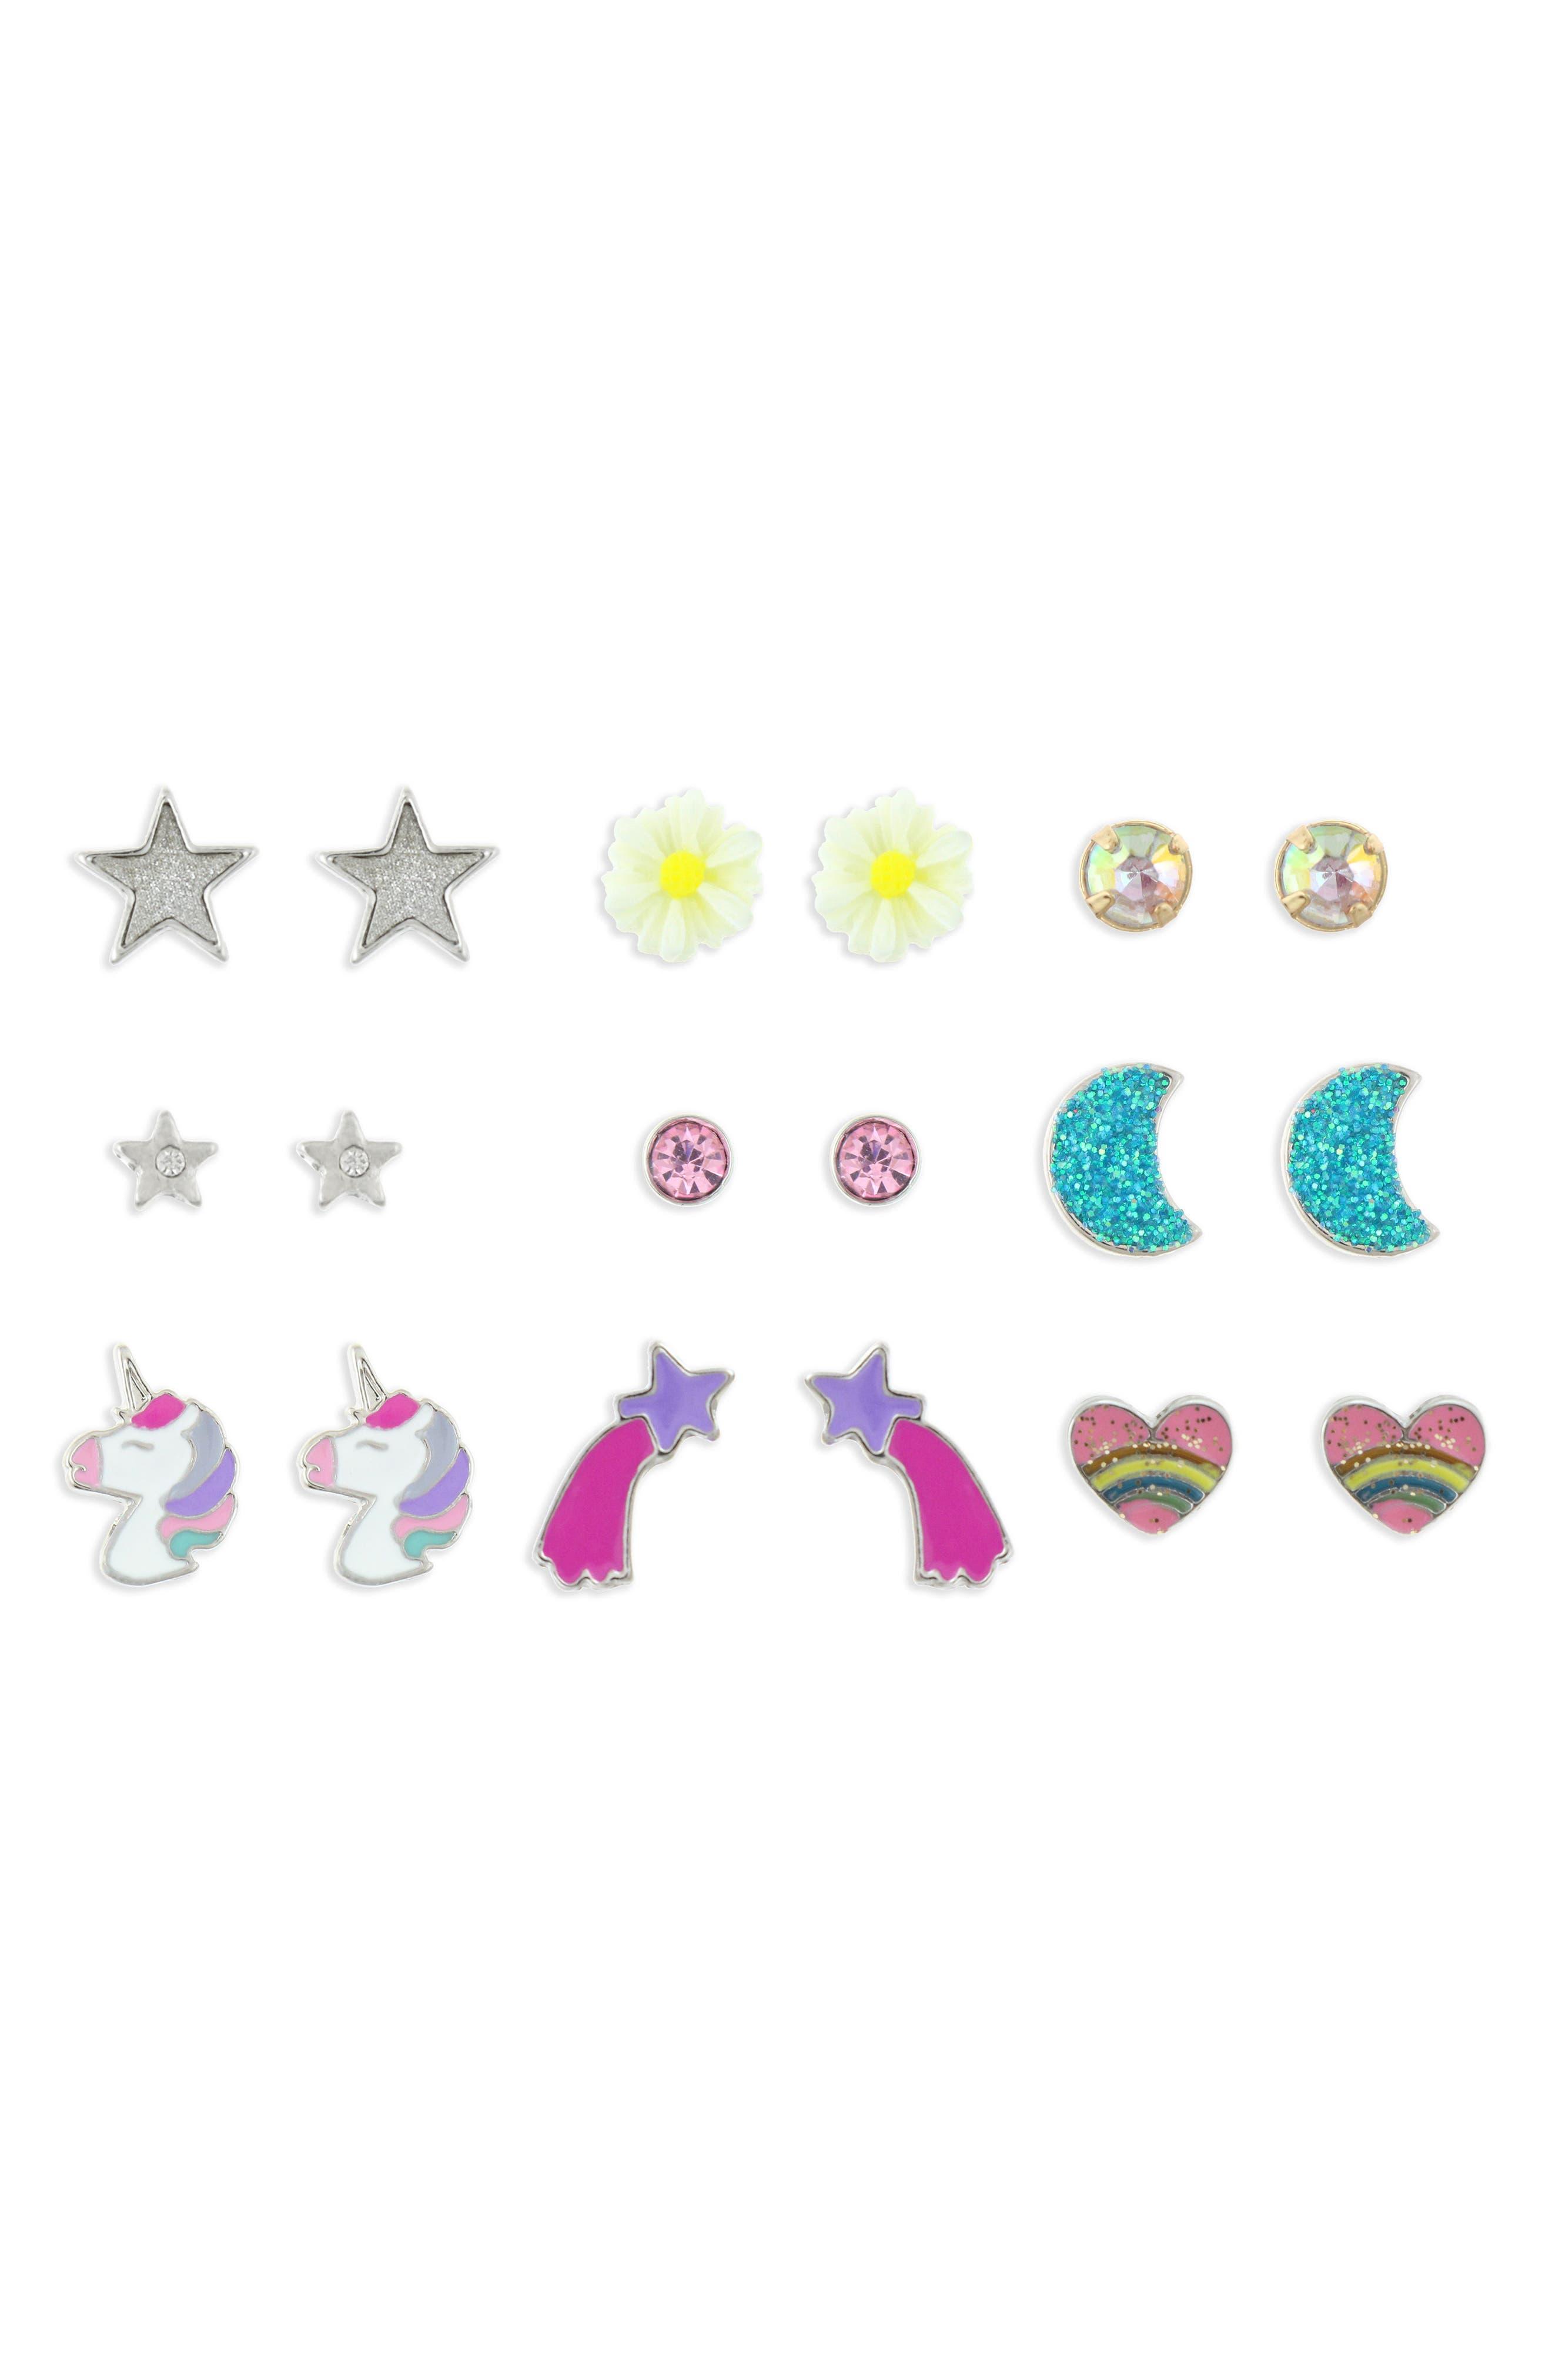 9-Pack Earring Set,                             Alternate thumbnail 4, color,                             SILVER MULTI